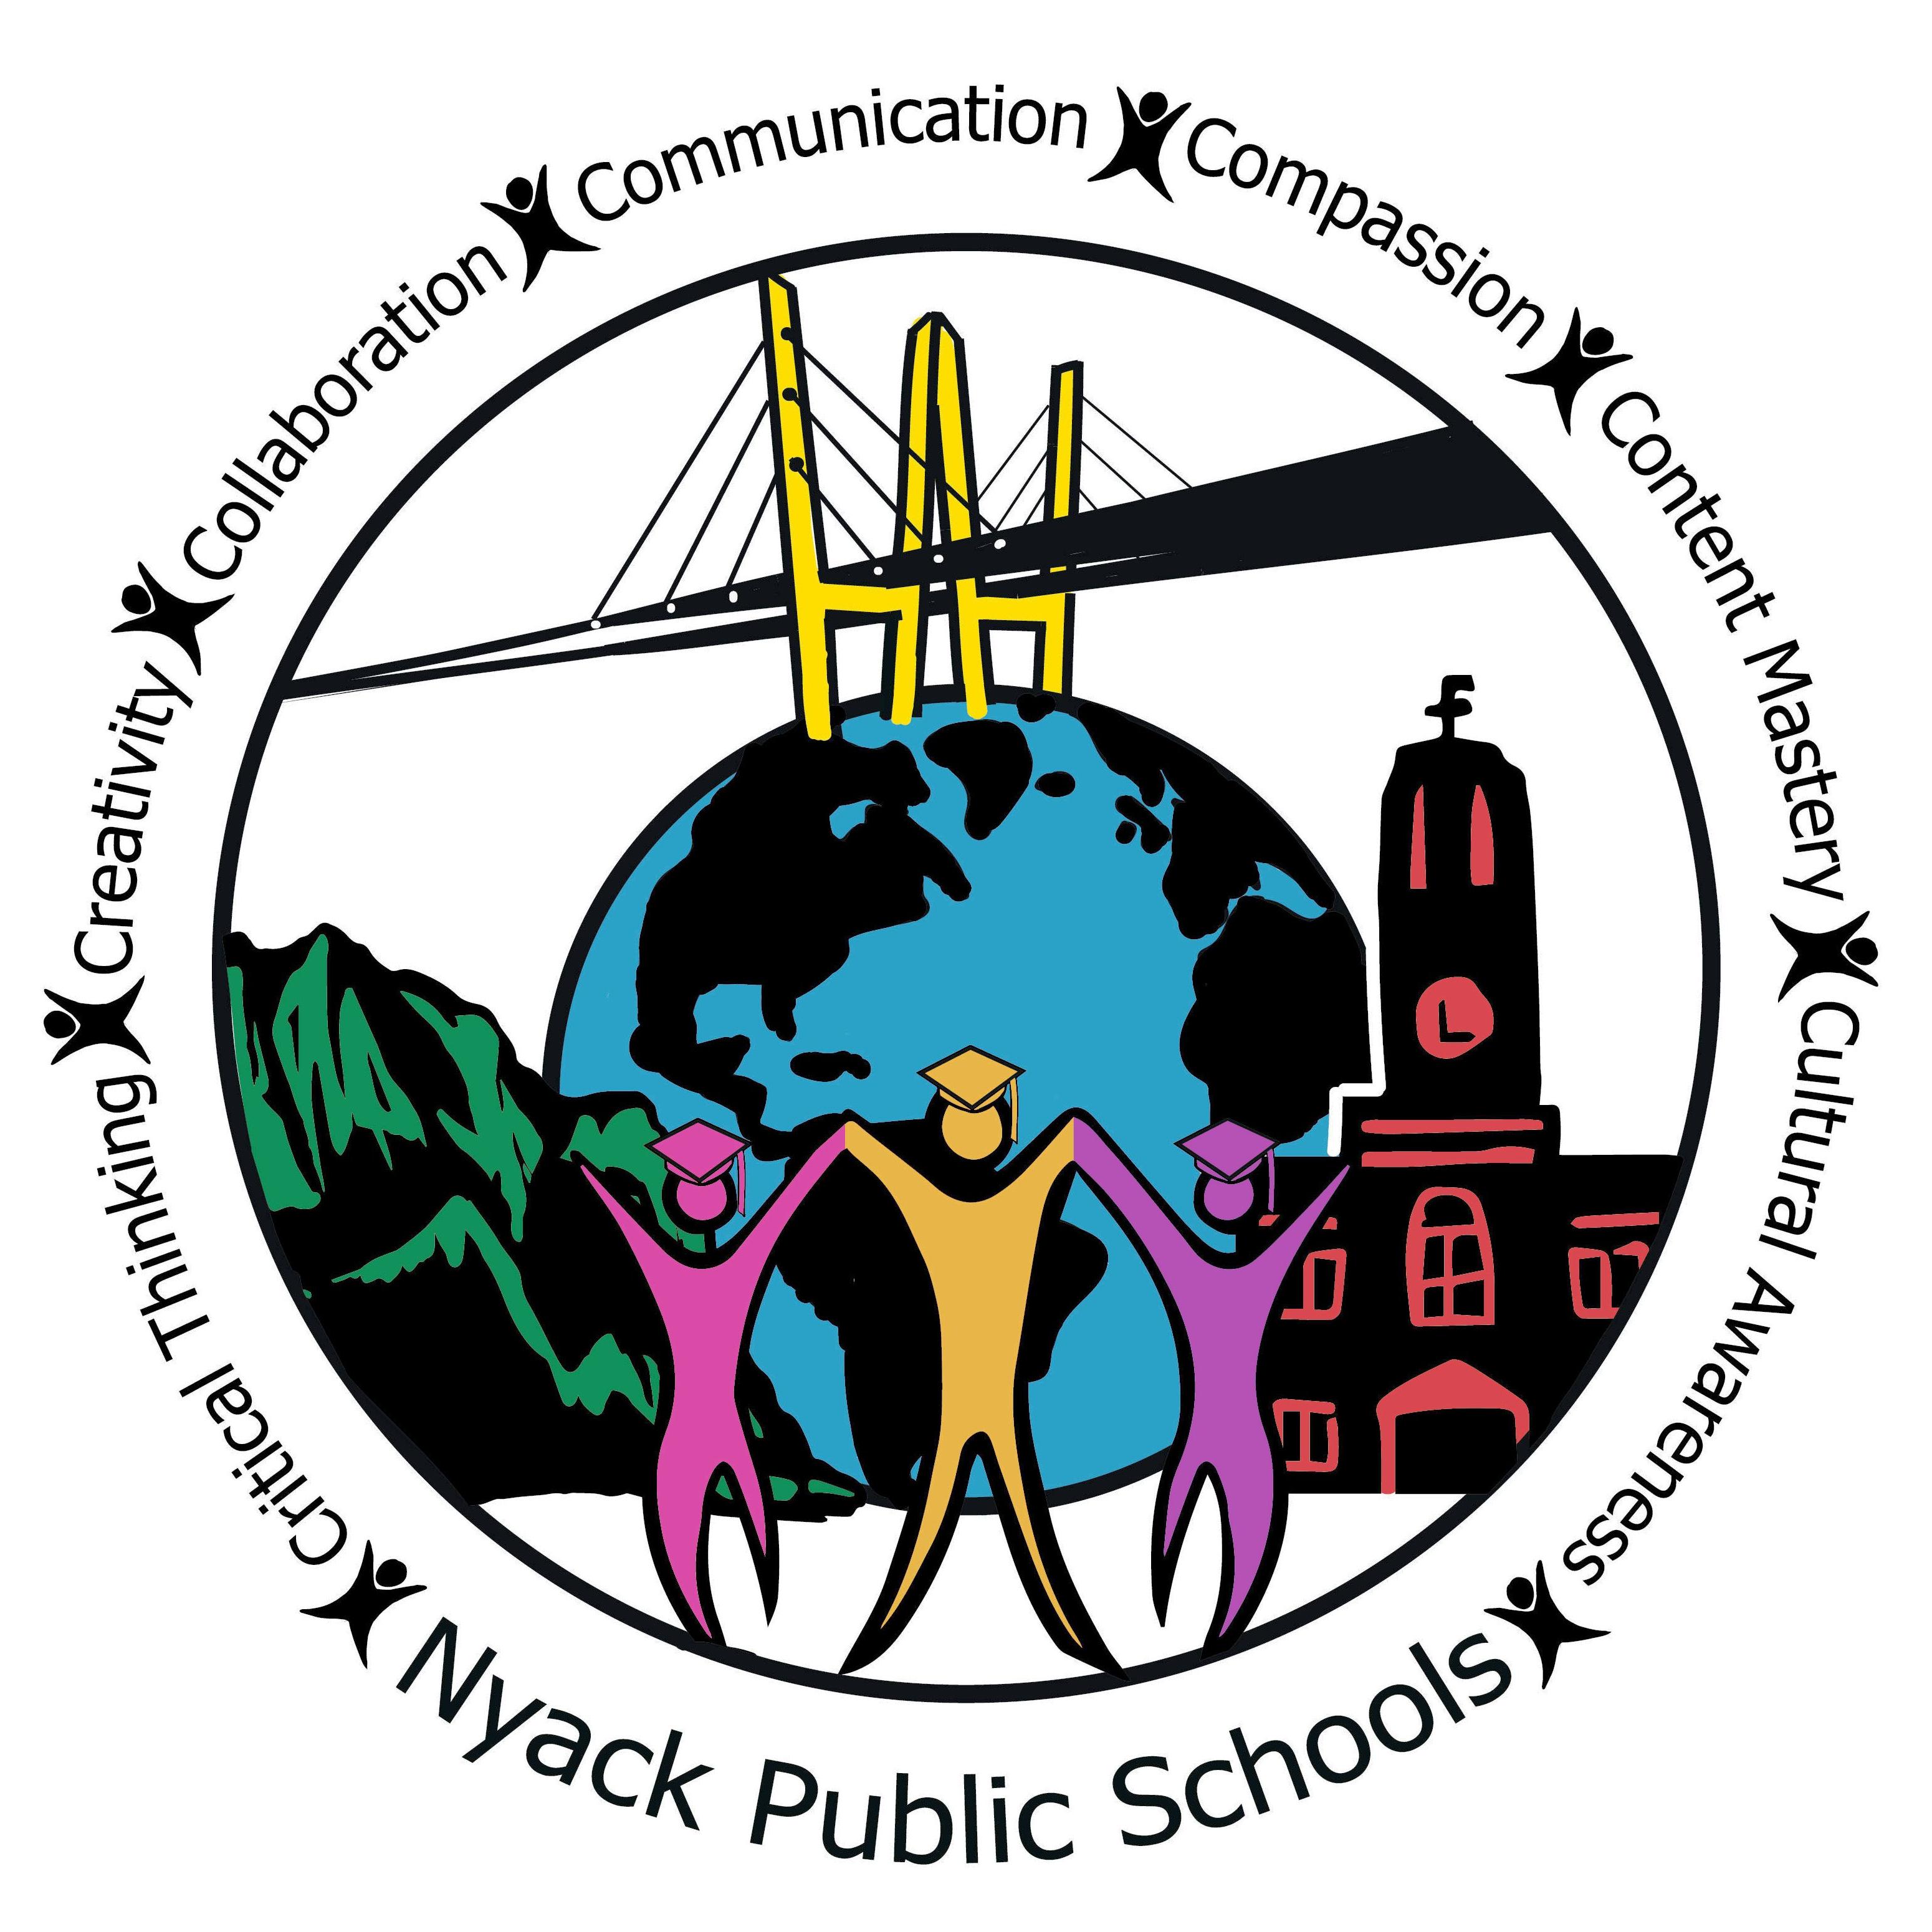 The Nyack Public Schools Logo